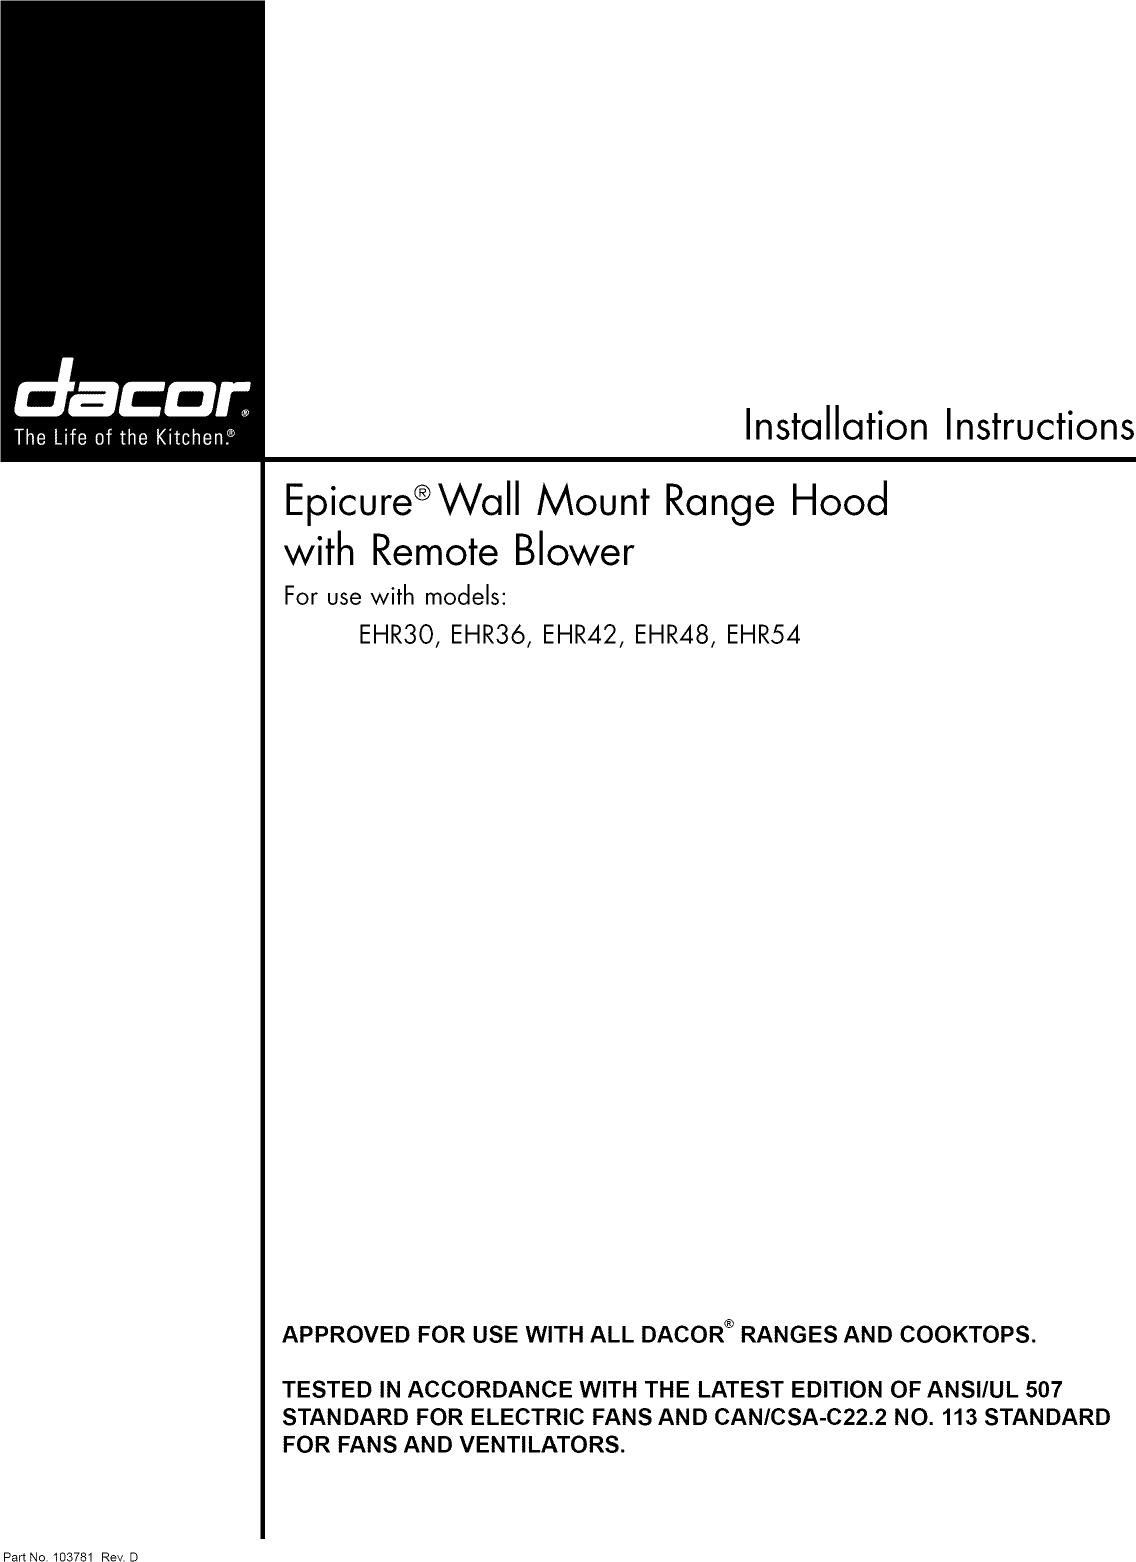 dacor ehr3612sch user manual range hood manuals and guides 1006372l rh usermanual wiki Dacor Range Hood Light Bulbs Dacor Range Hood Light Bulbs